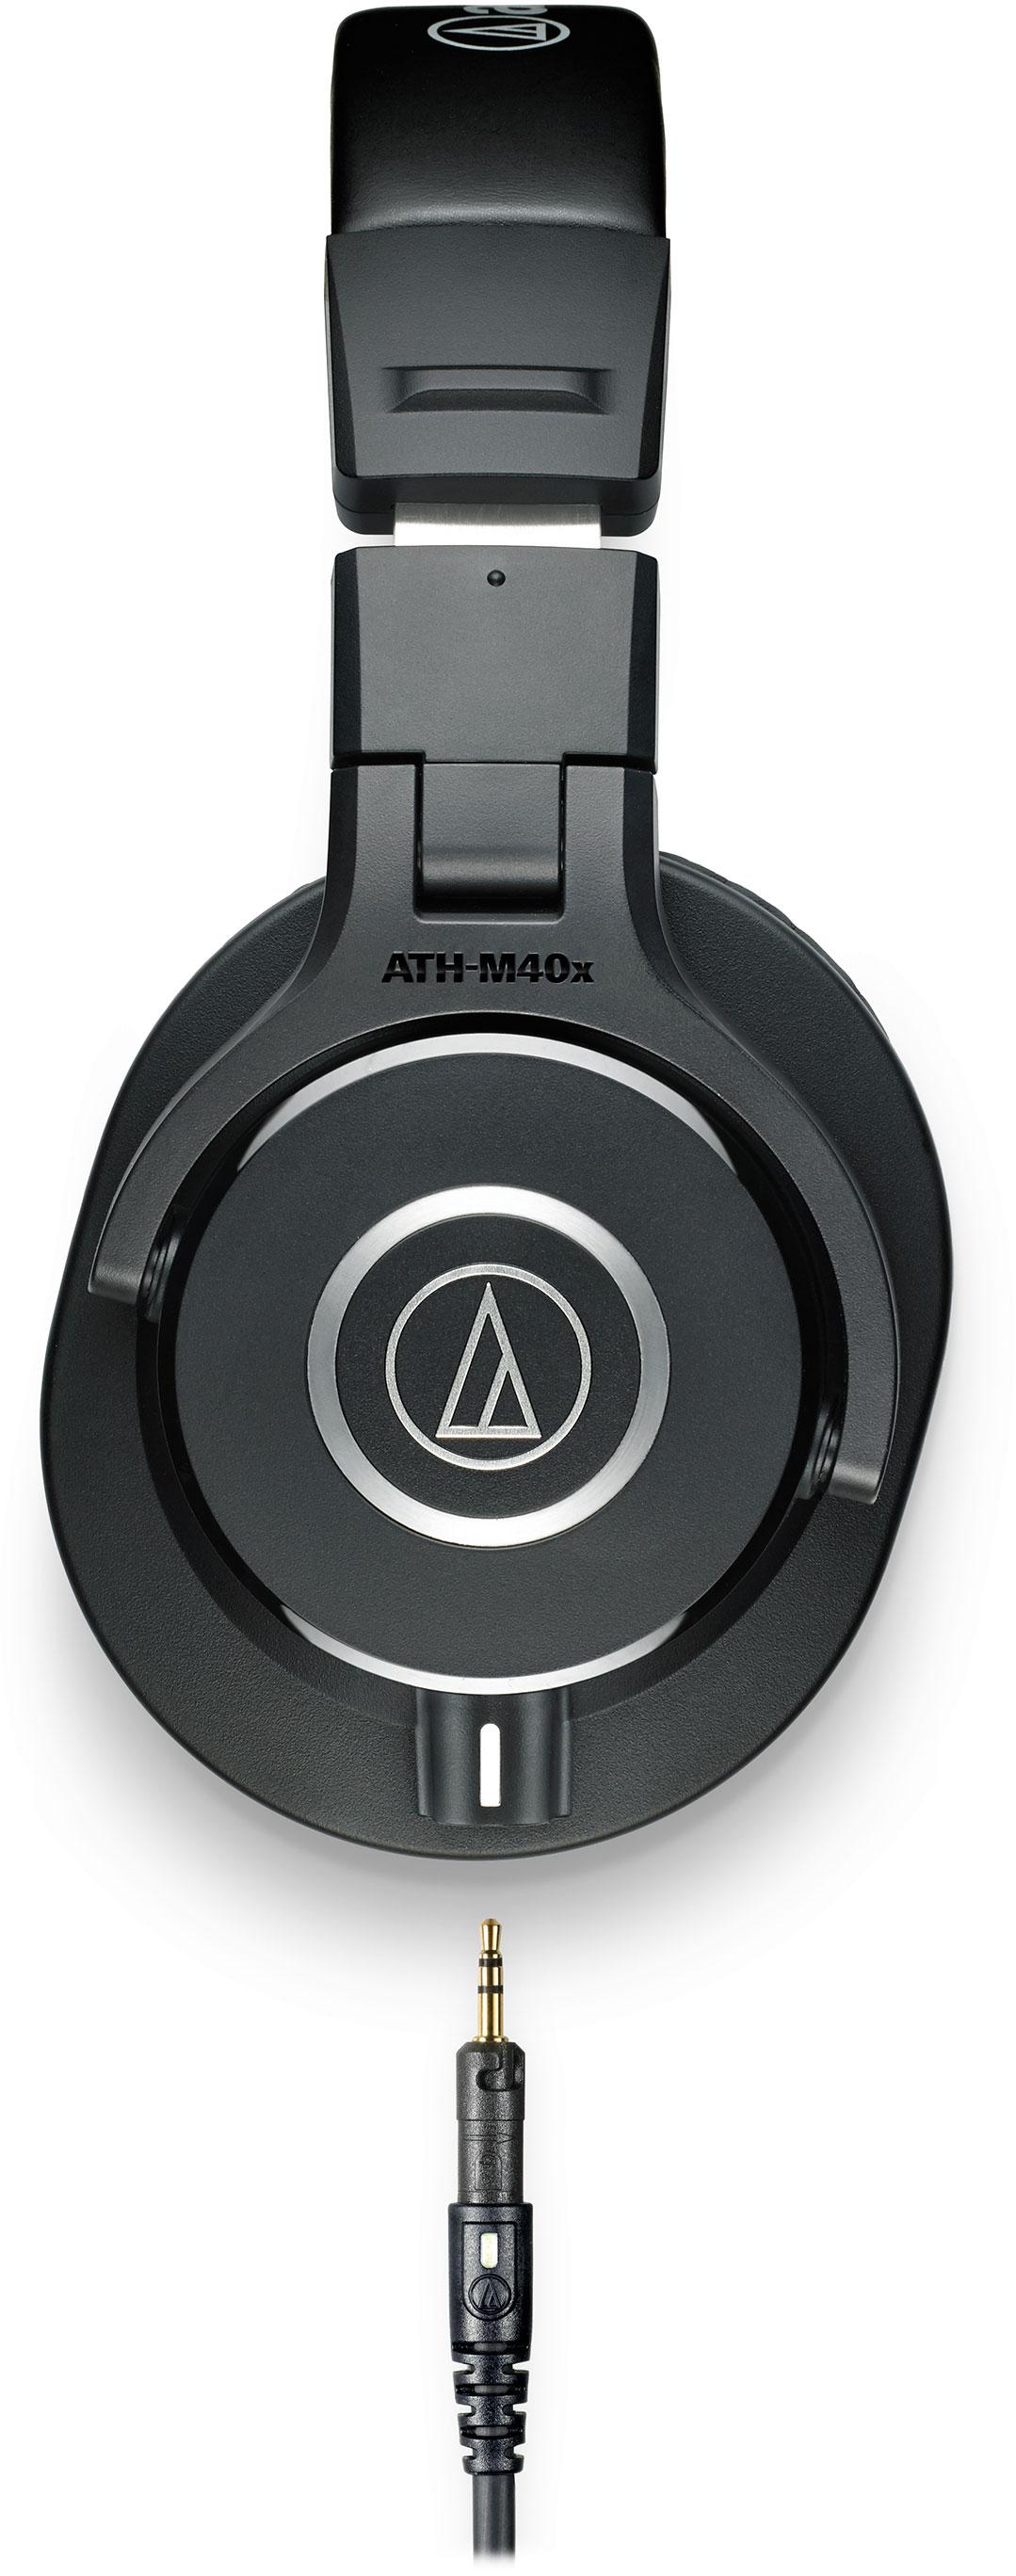 audio technica ath m40x professional studio monitor headphones cena evra ean code. Black Bedroom Furniture Sets. Home Design Ideas